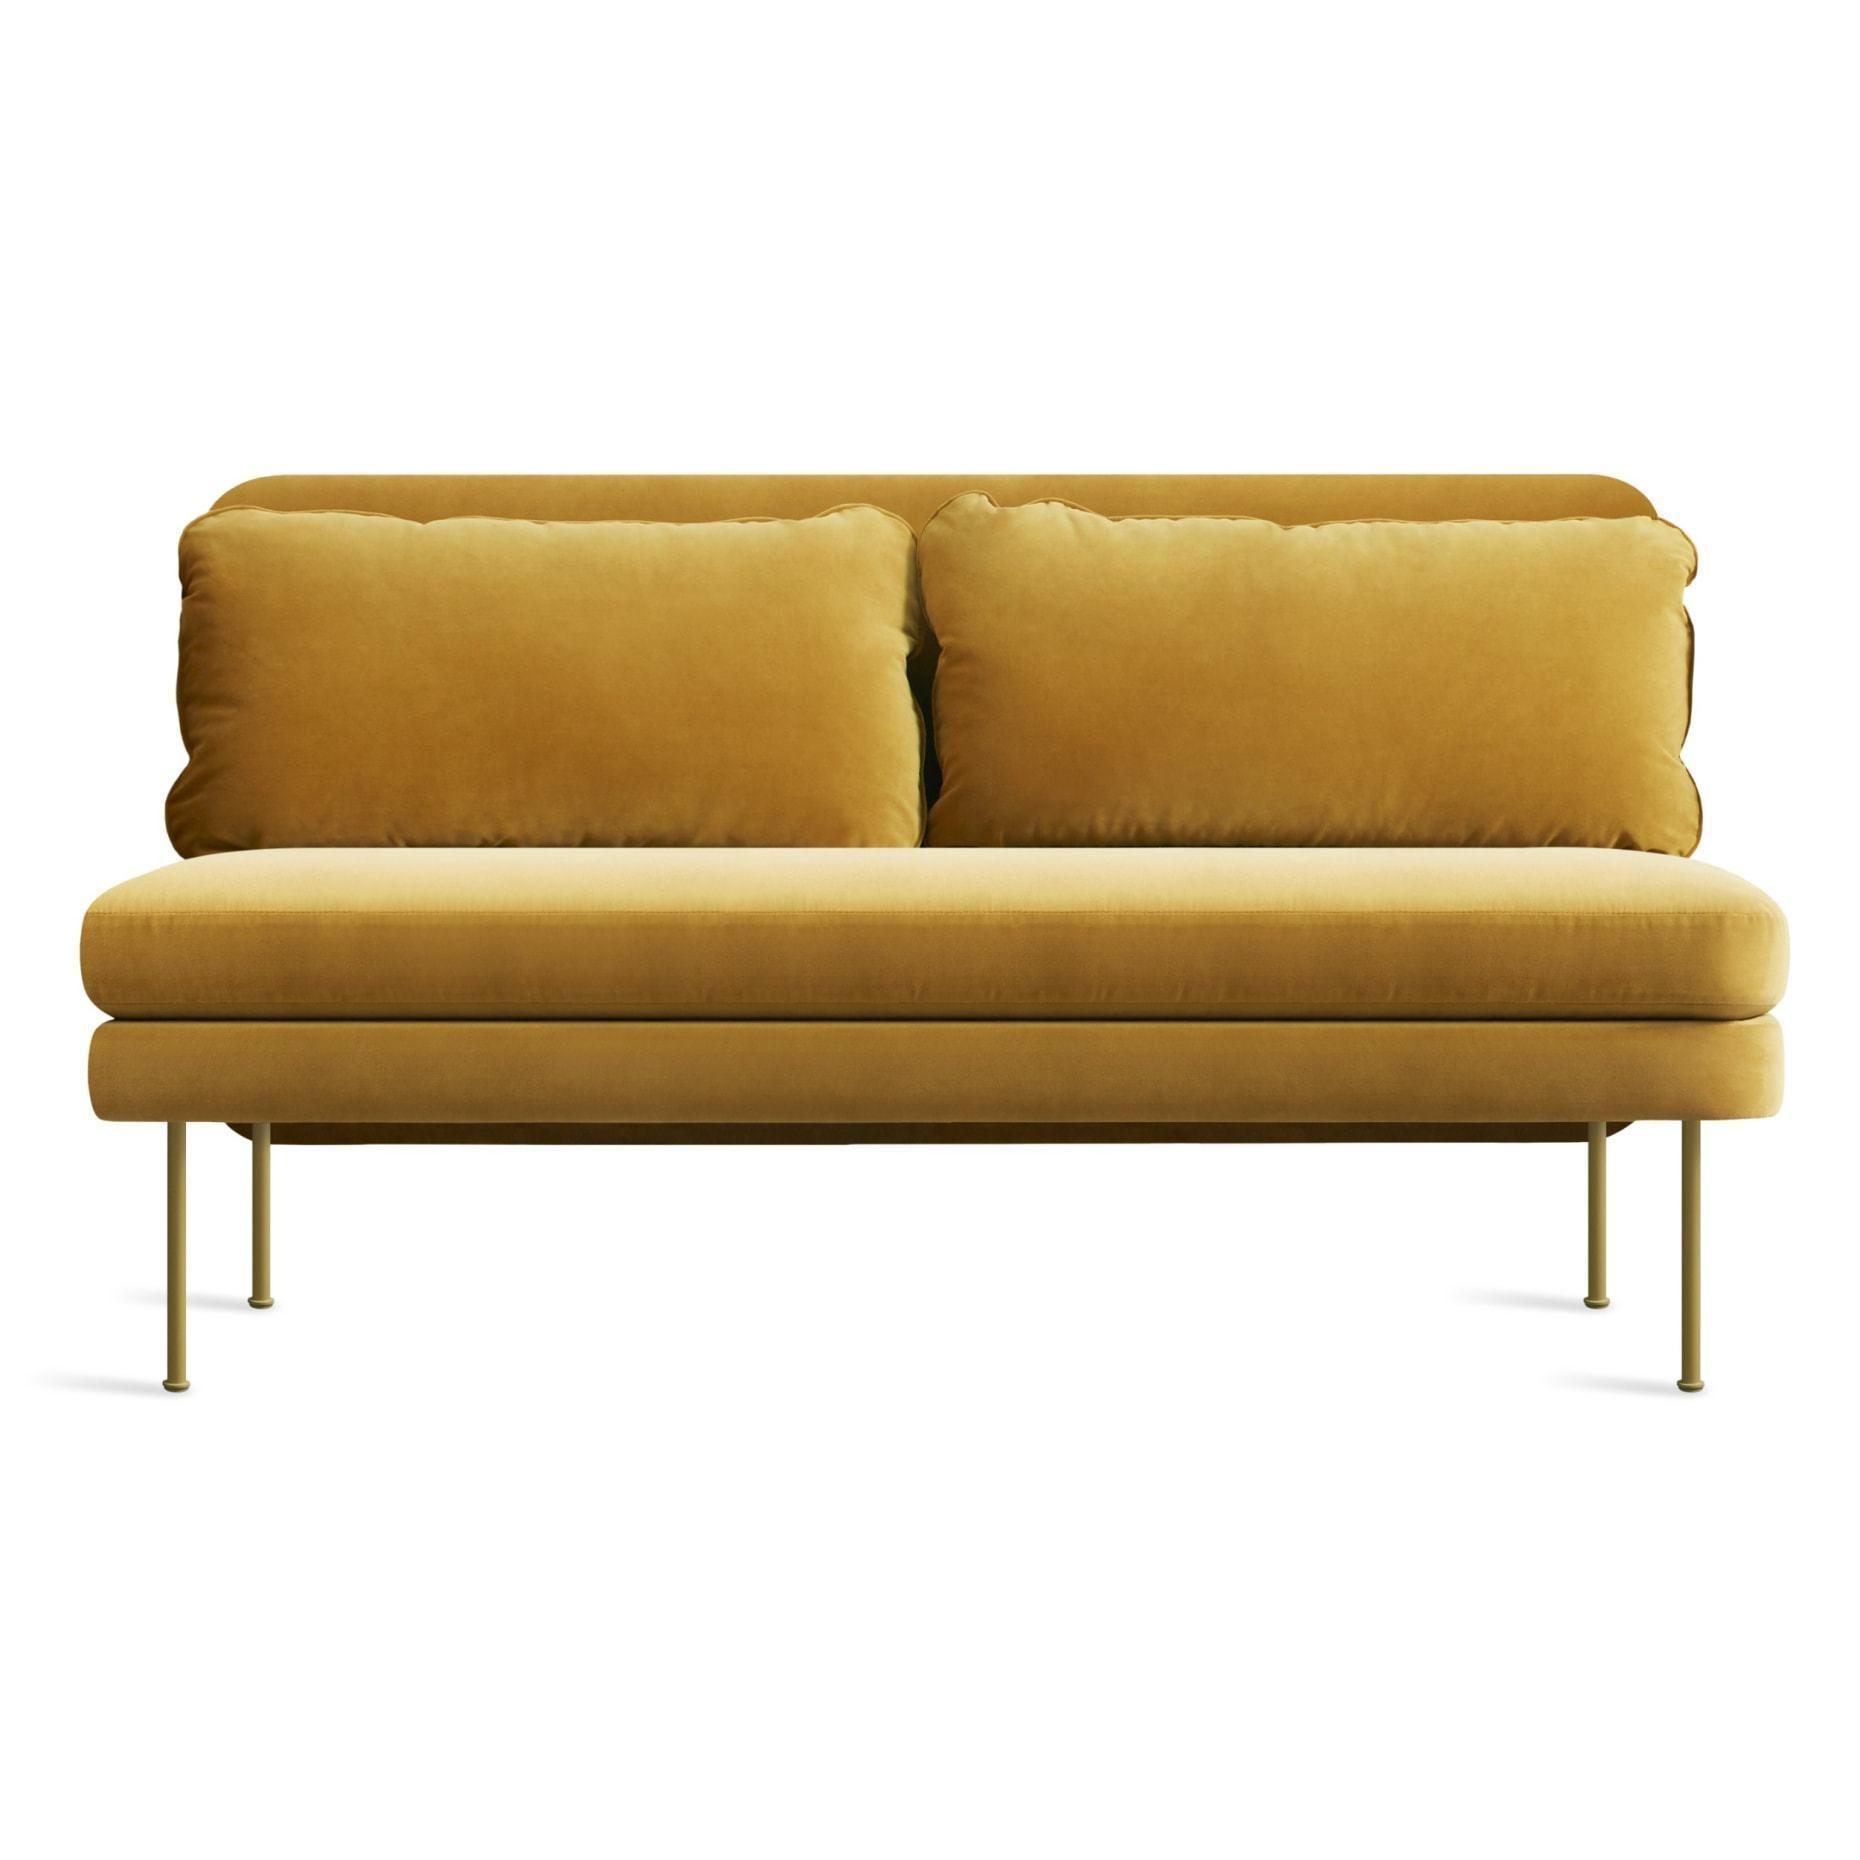 Bloke Armless Sofa in 2020 Armless sofa, Velvet sofa